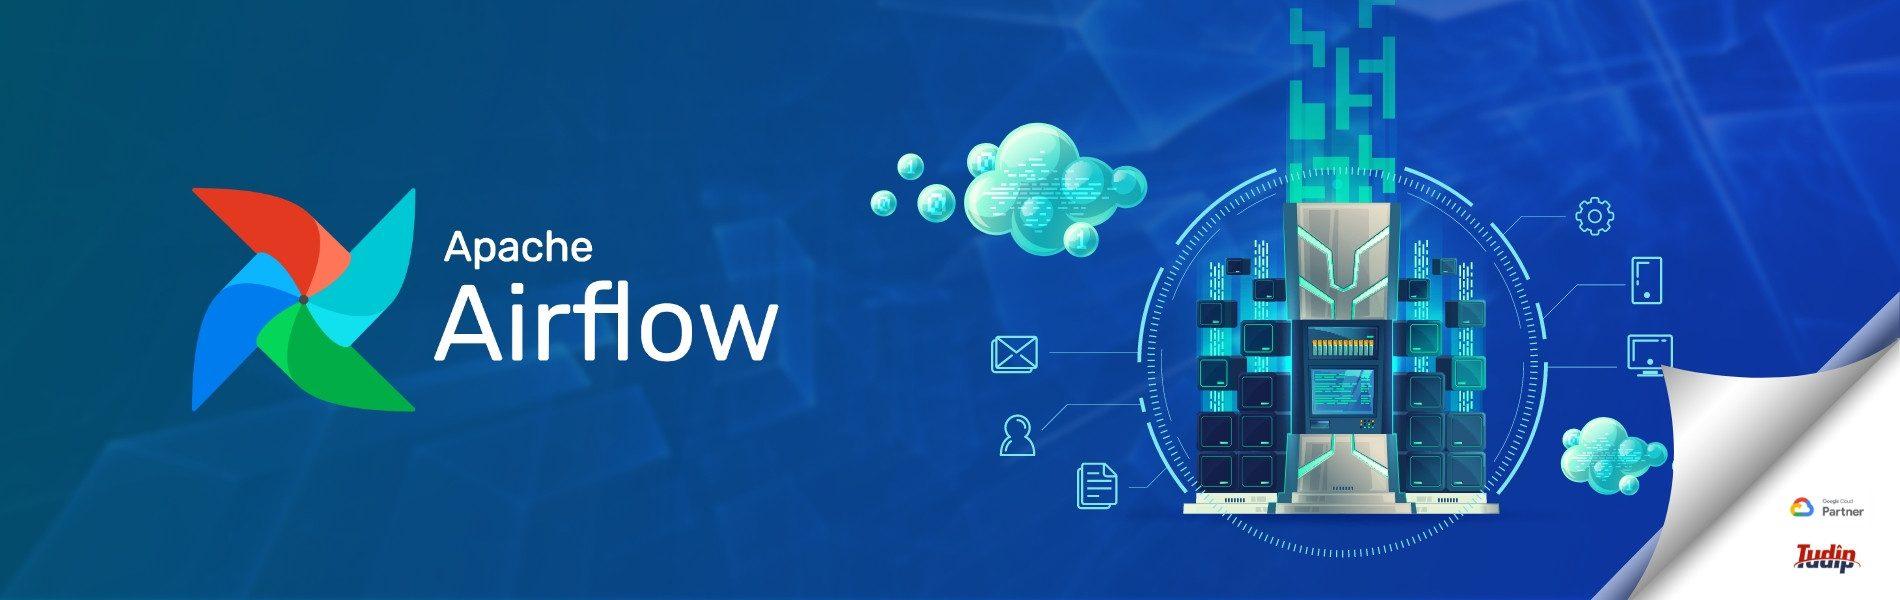 Cloud Composer: A Managed Apache Airflow Service